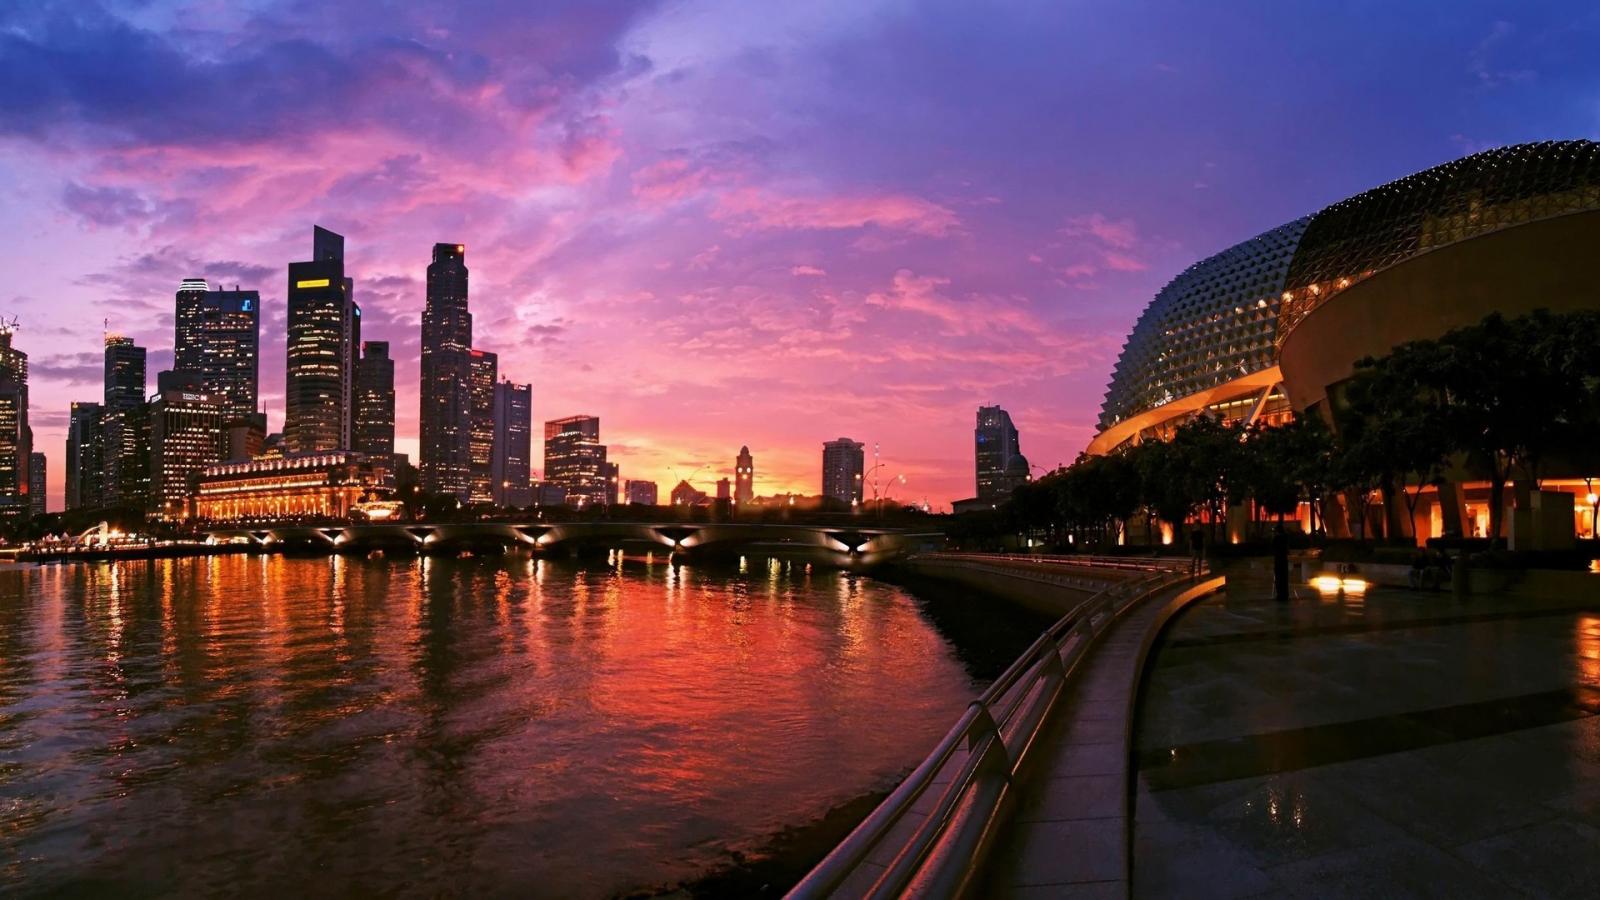 Singapore 1600 x 900 HDTV Wallpaper